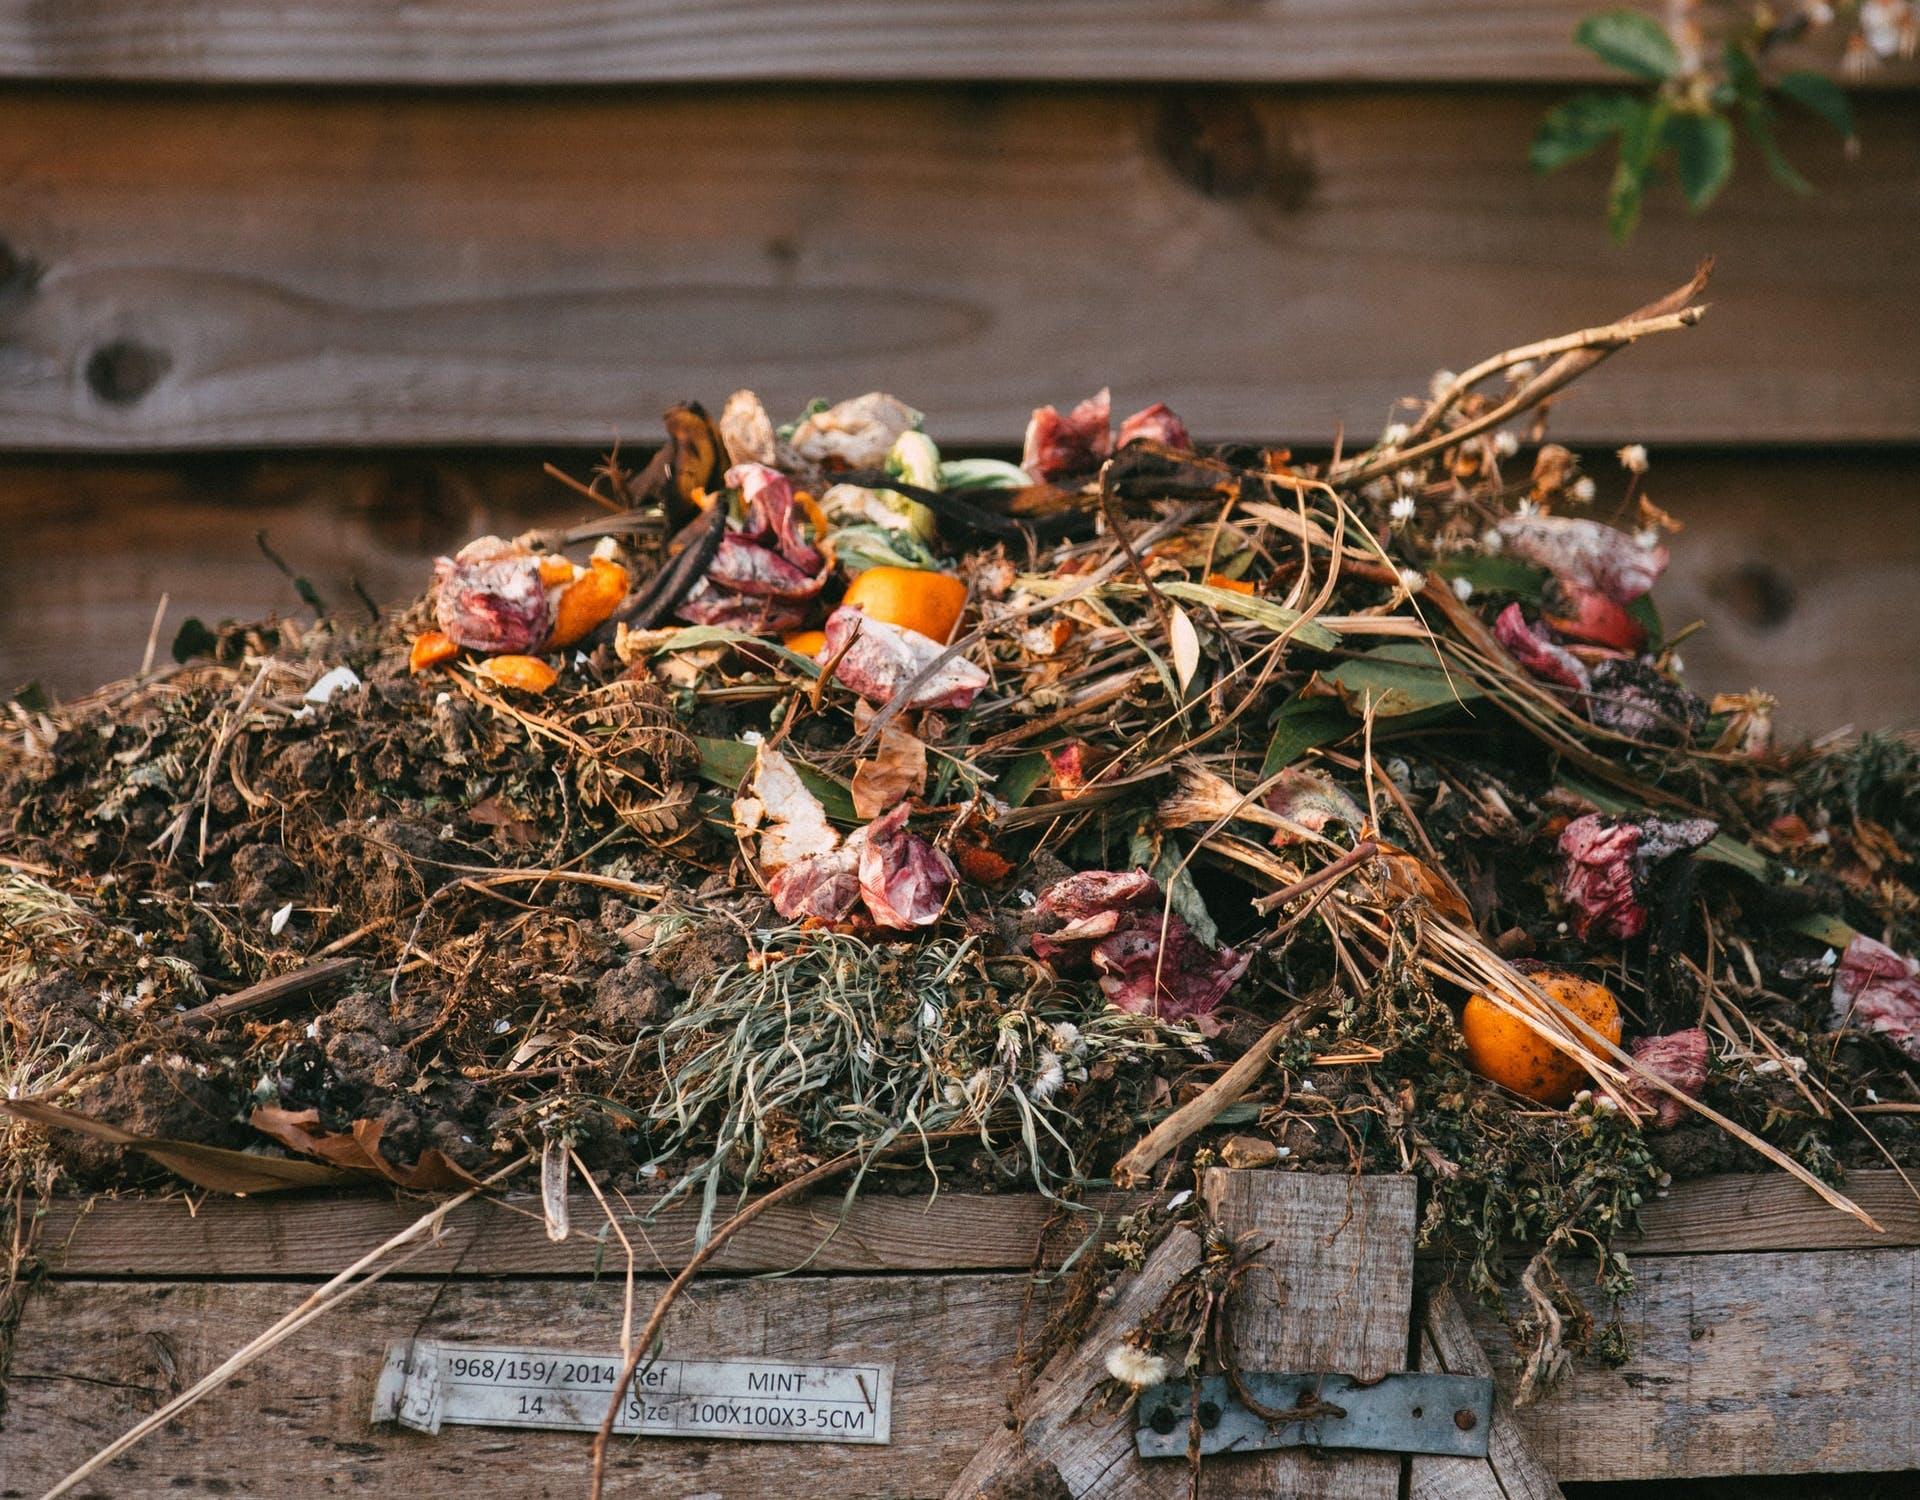 a compost pile